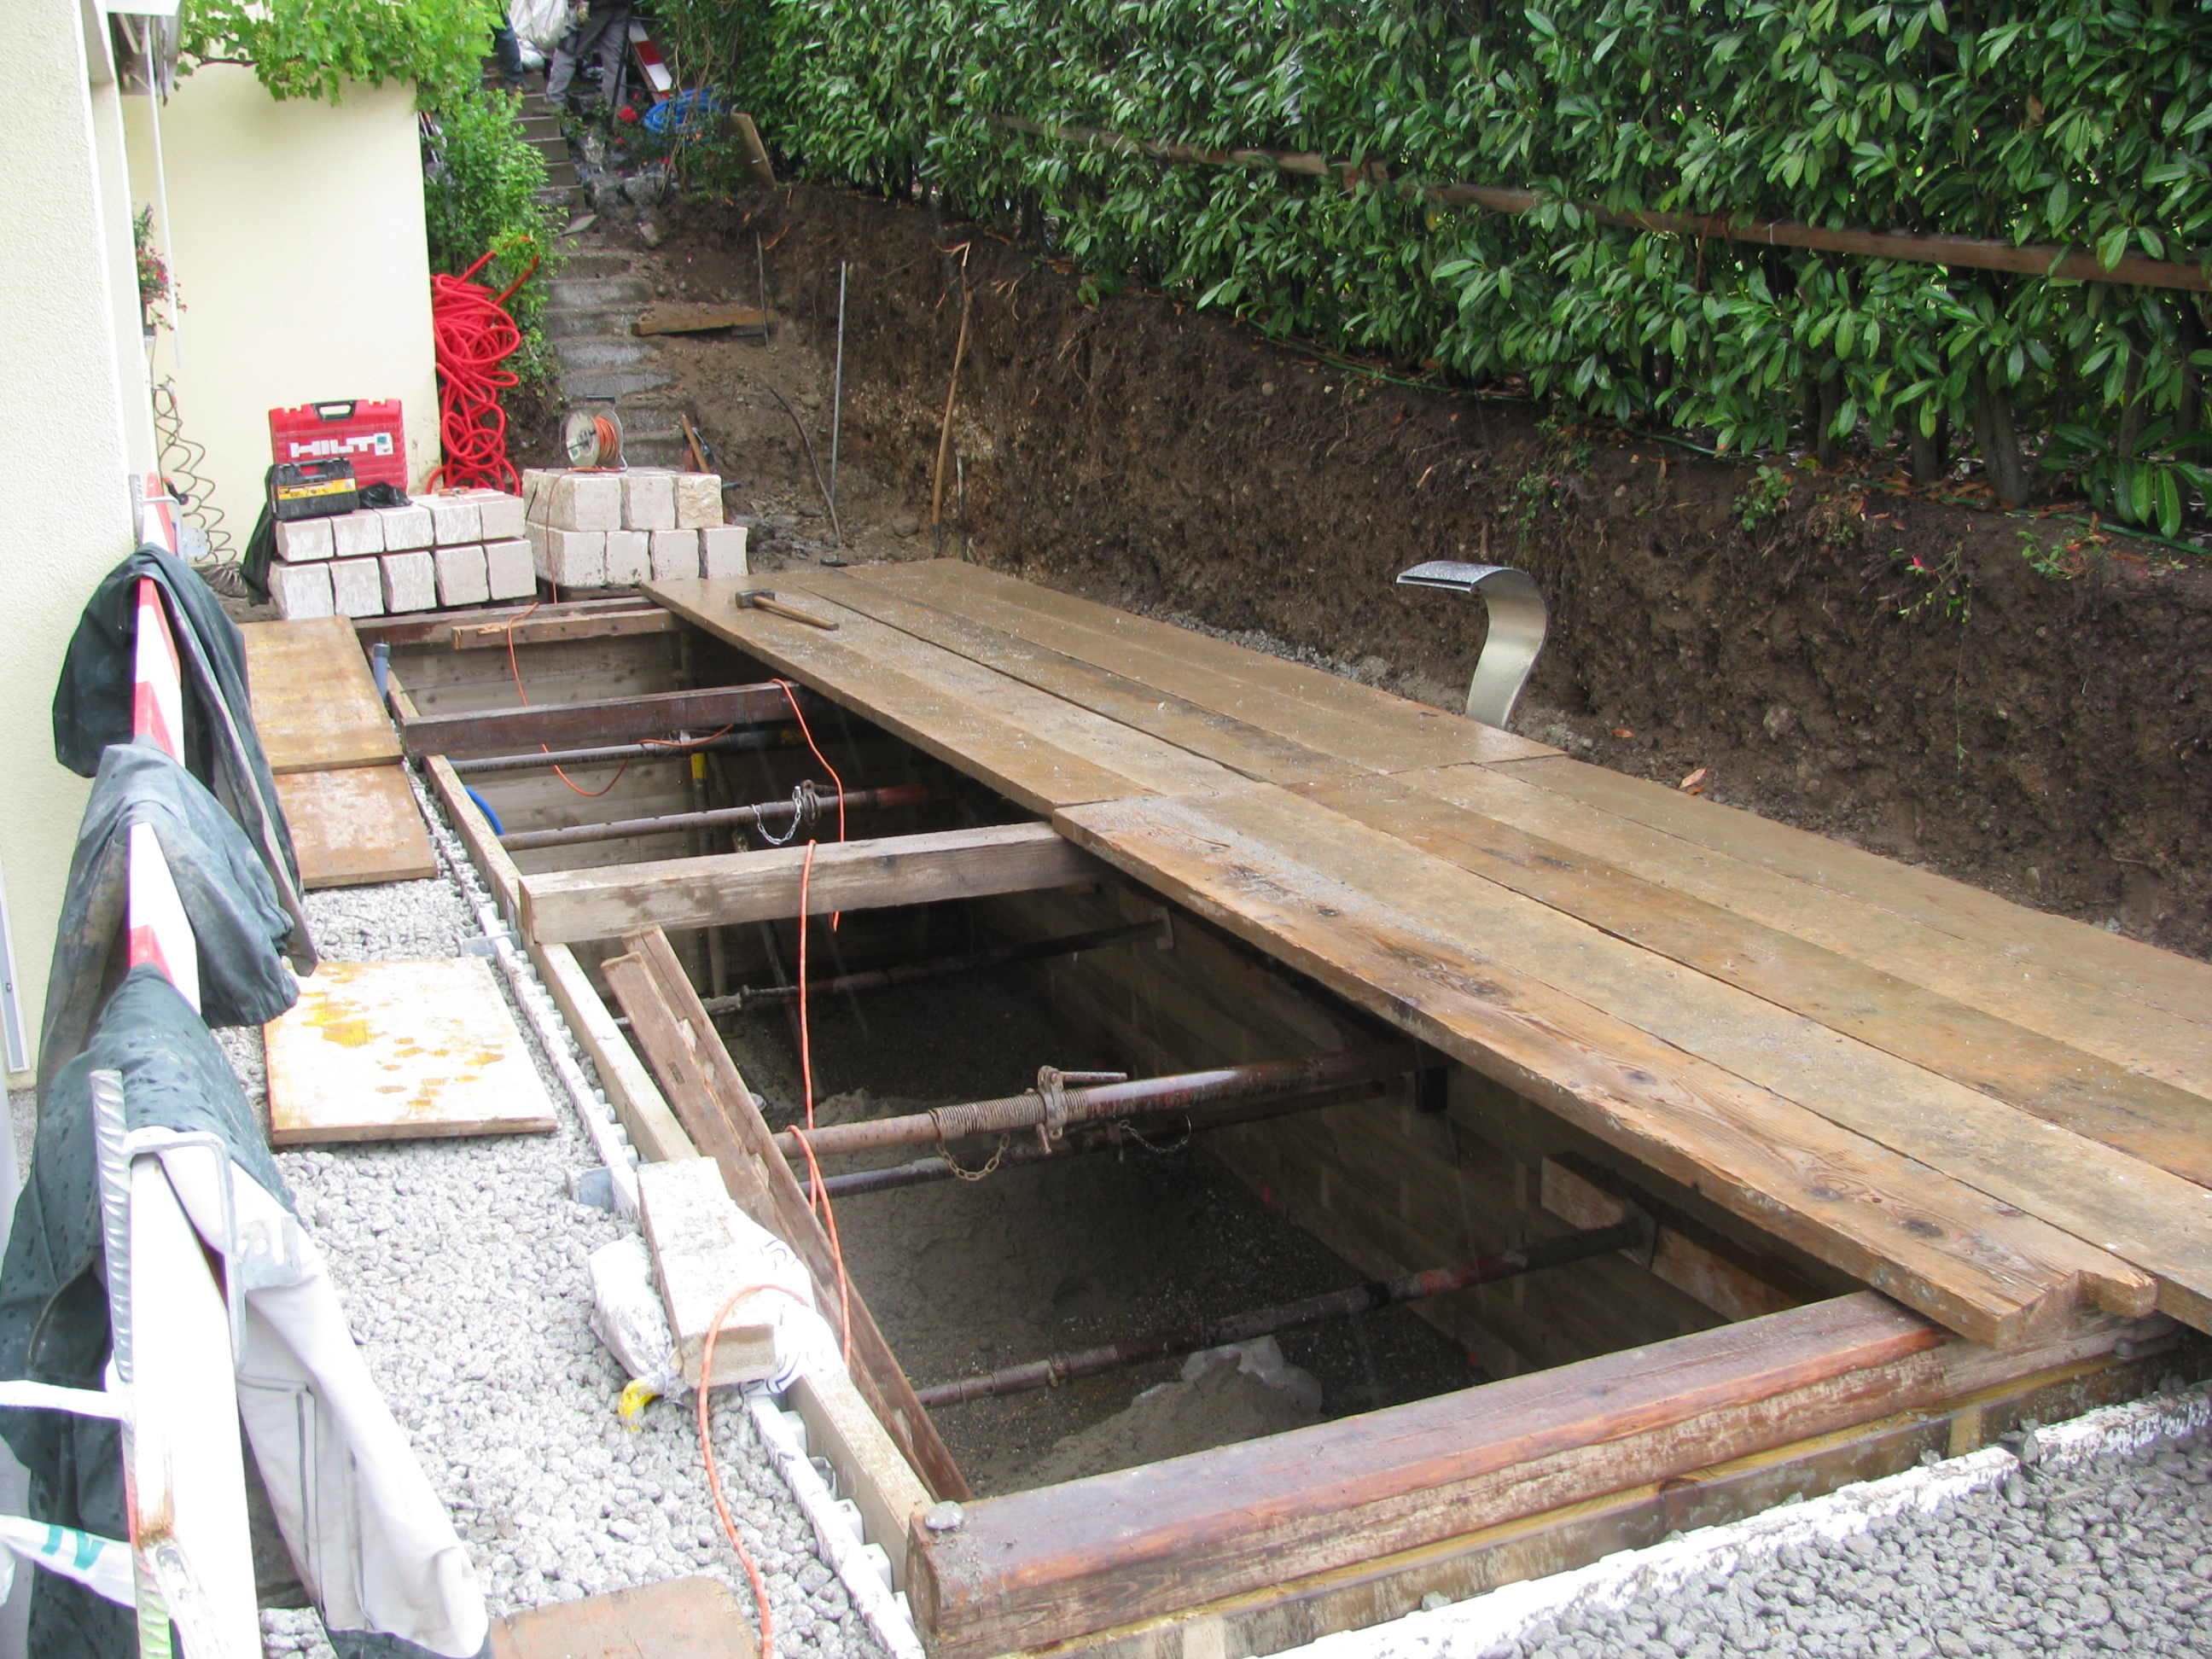 Garten im Umbau